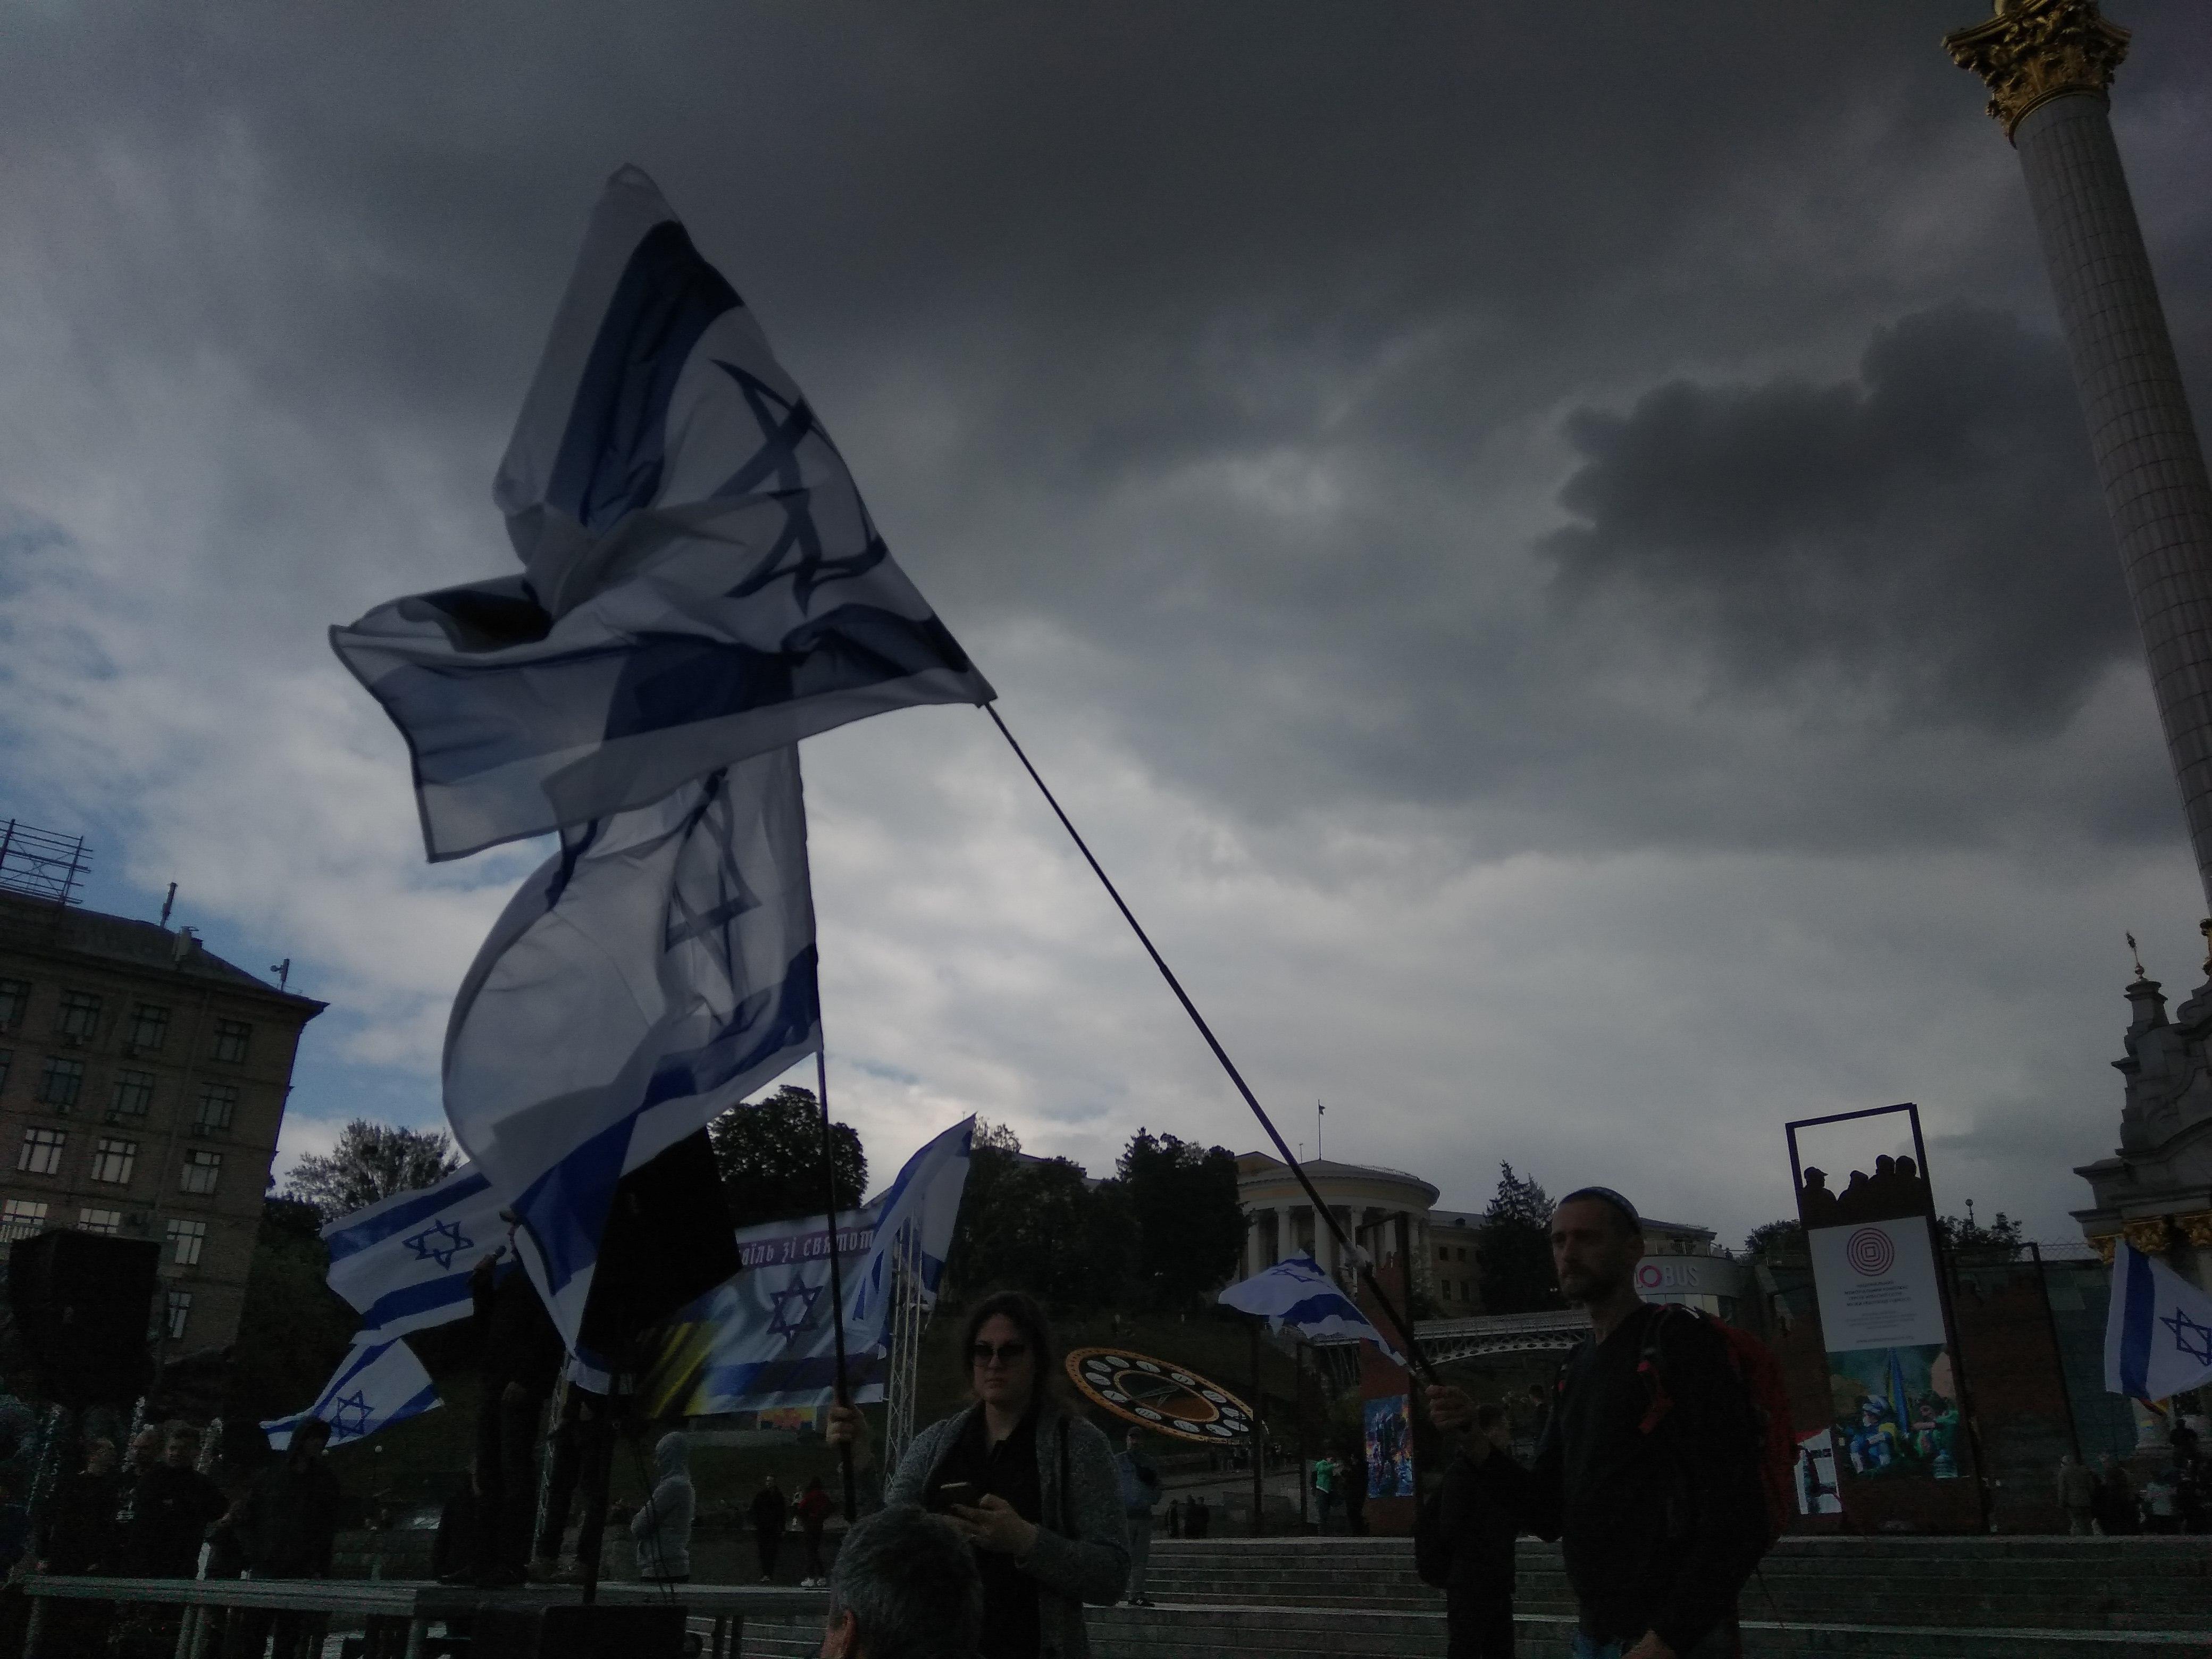 На Майдане Независимости сегодня отмечают семидесятилетие Израиля